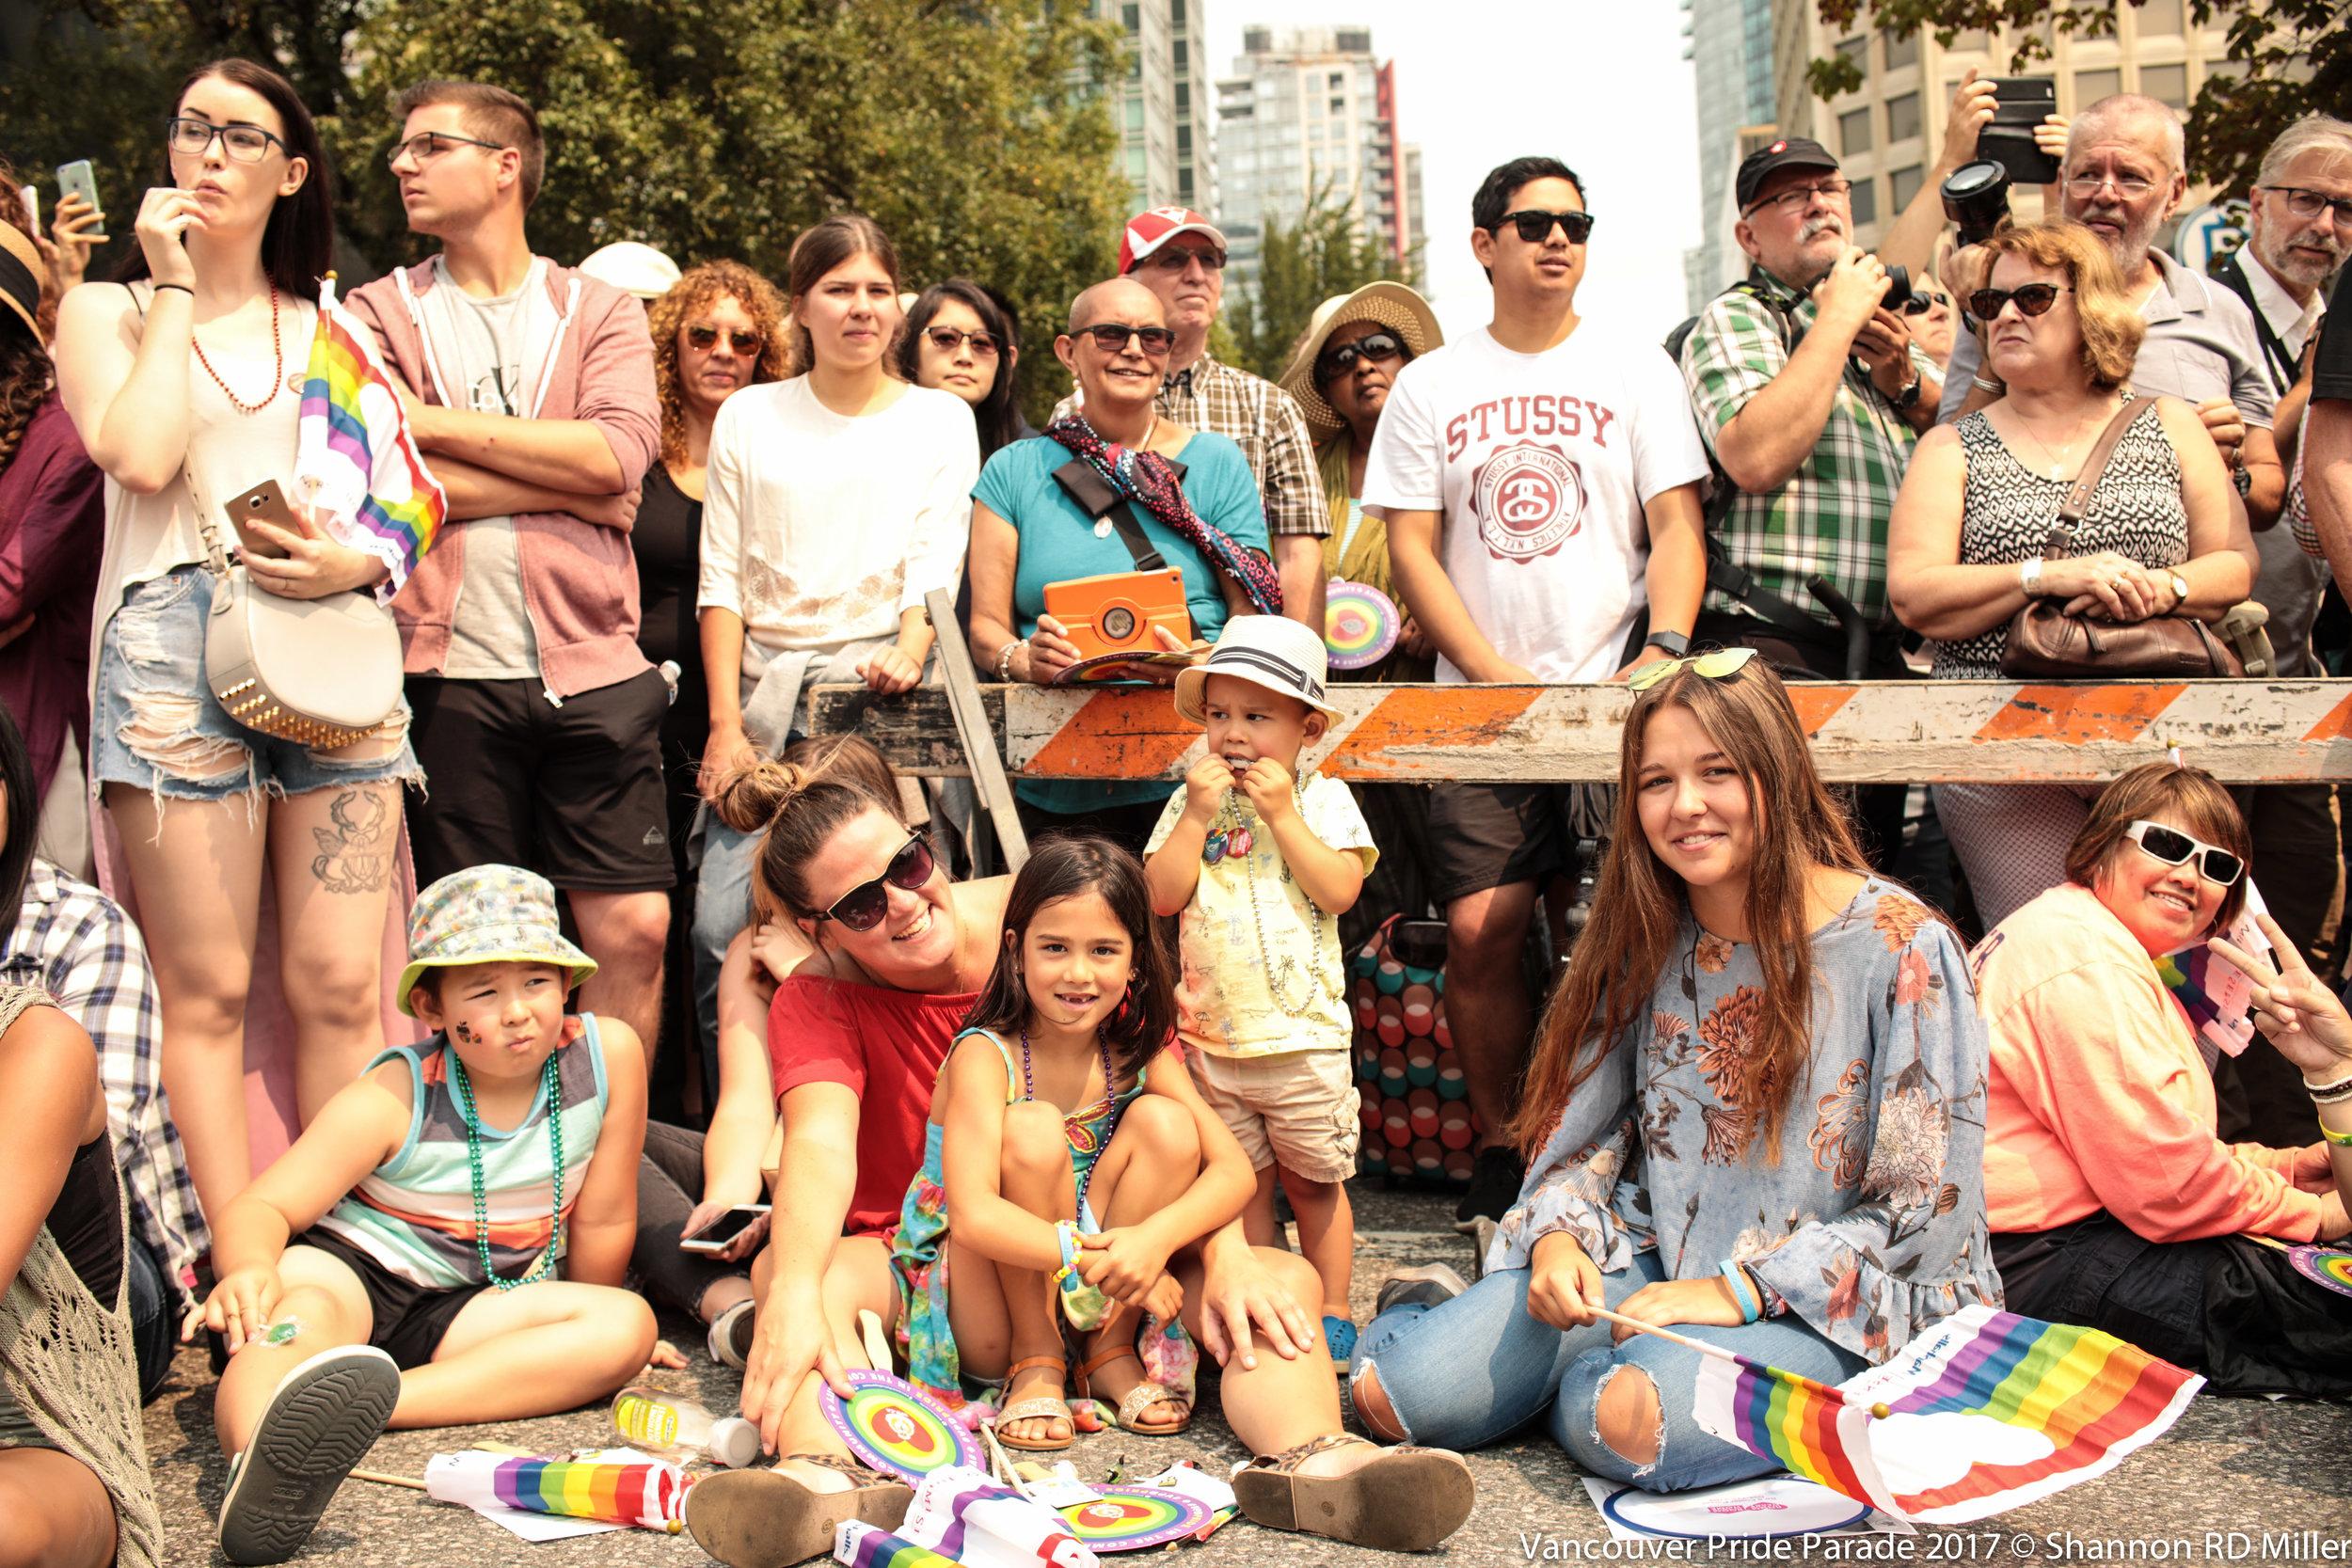 www.shannonruthdionne.com_Pride_Parade_20170806-3514.jpg